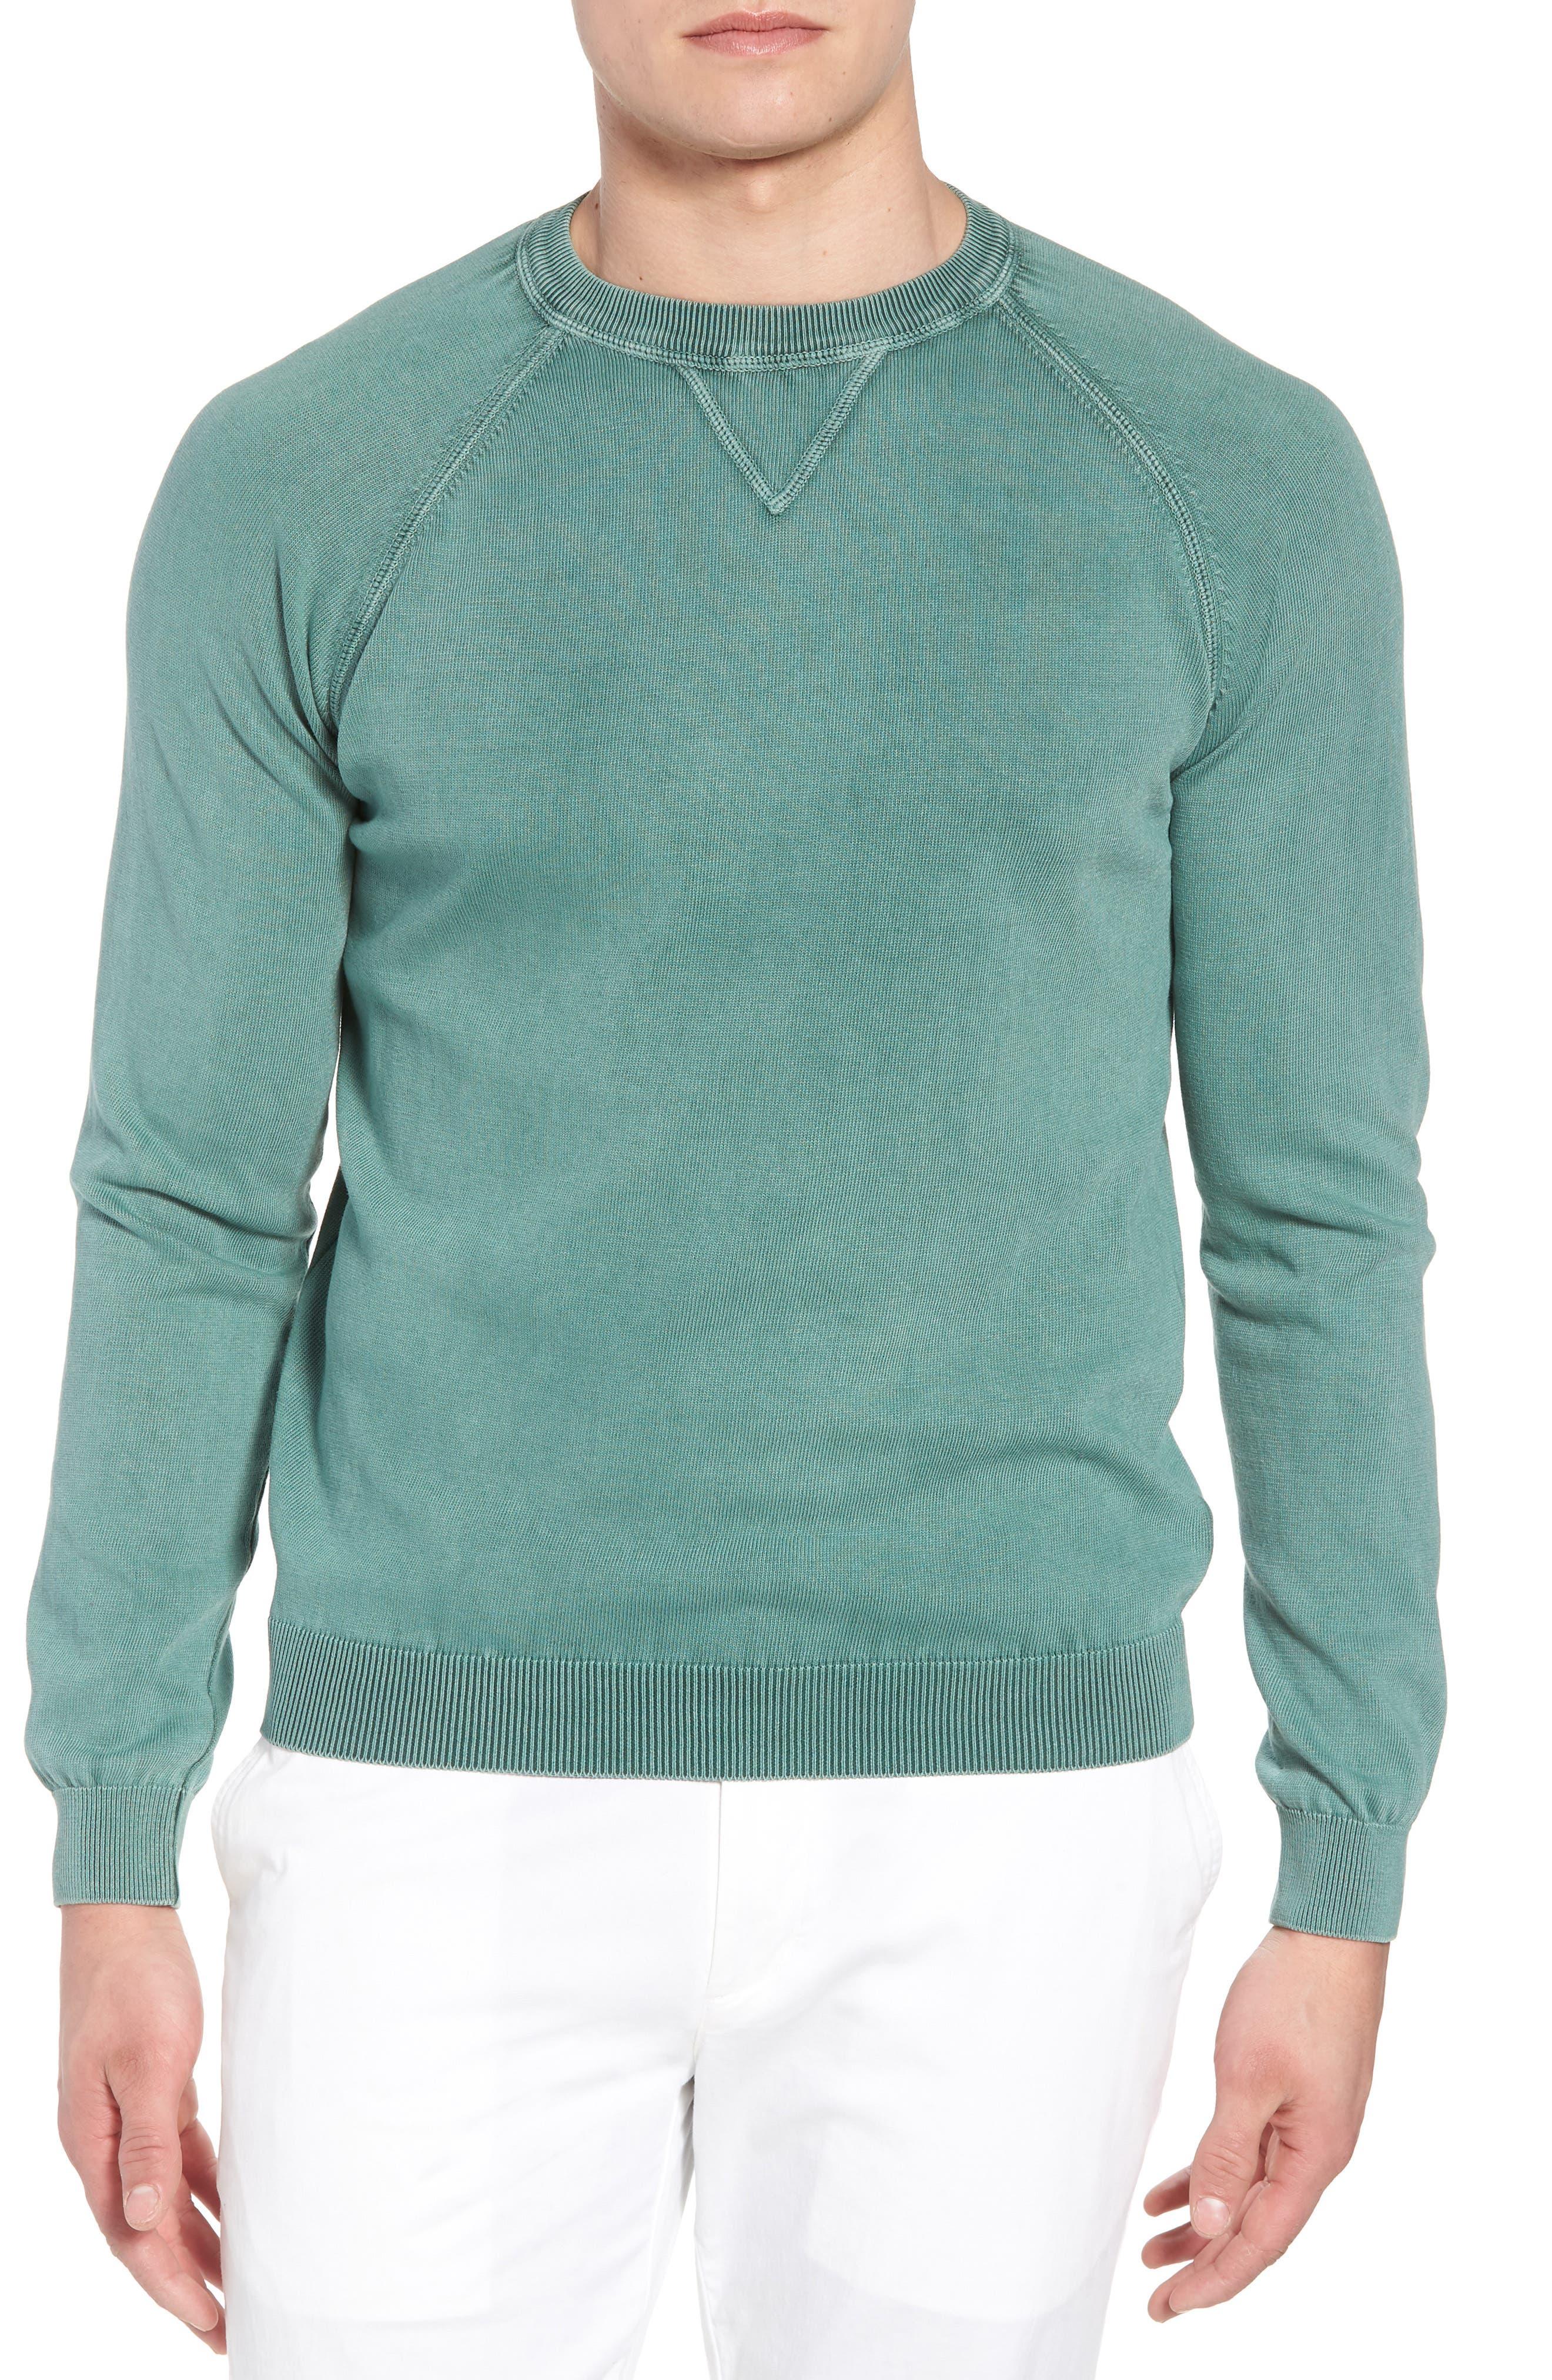 Stonewash Cotton Sweatshirt,                             Main thumbnail 1, color,                             333